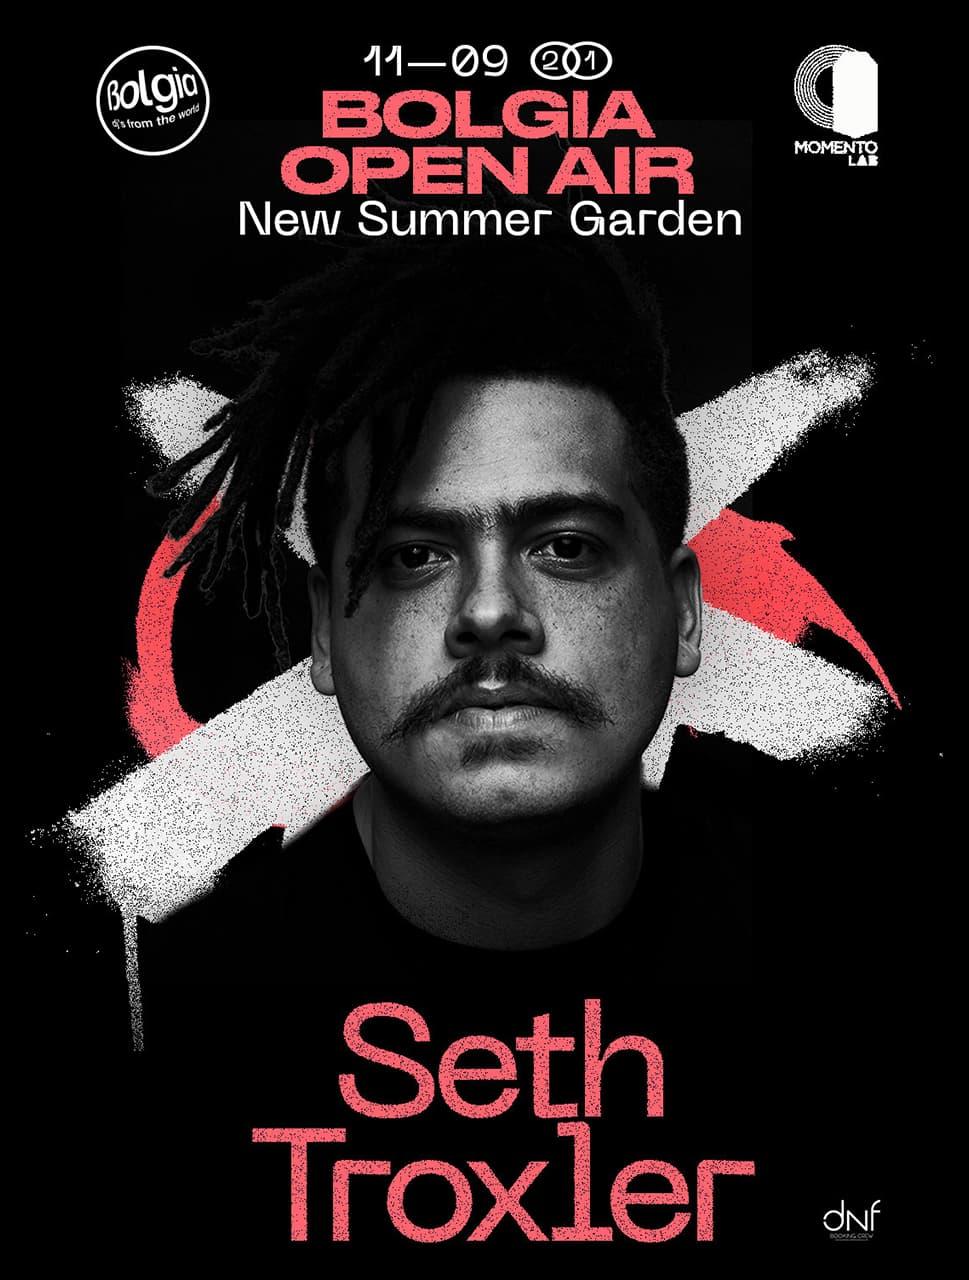 SETH TROXLER New Summer Garden